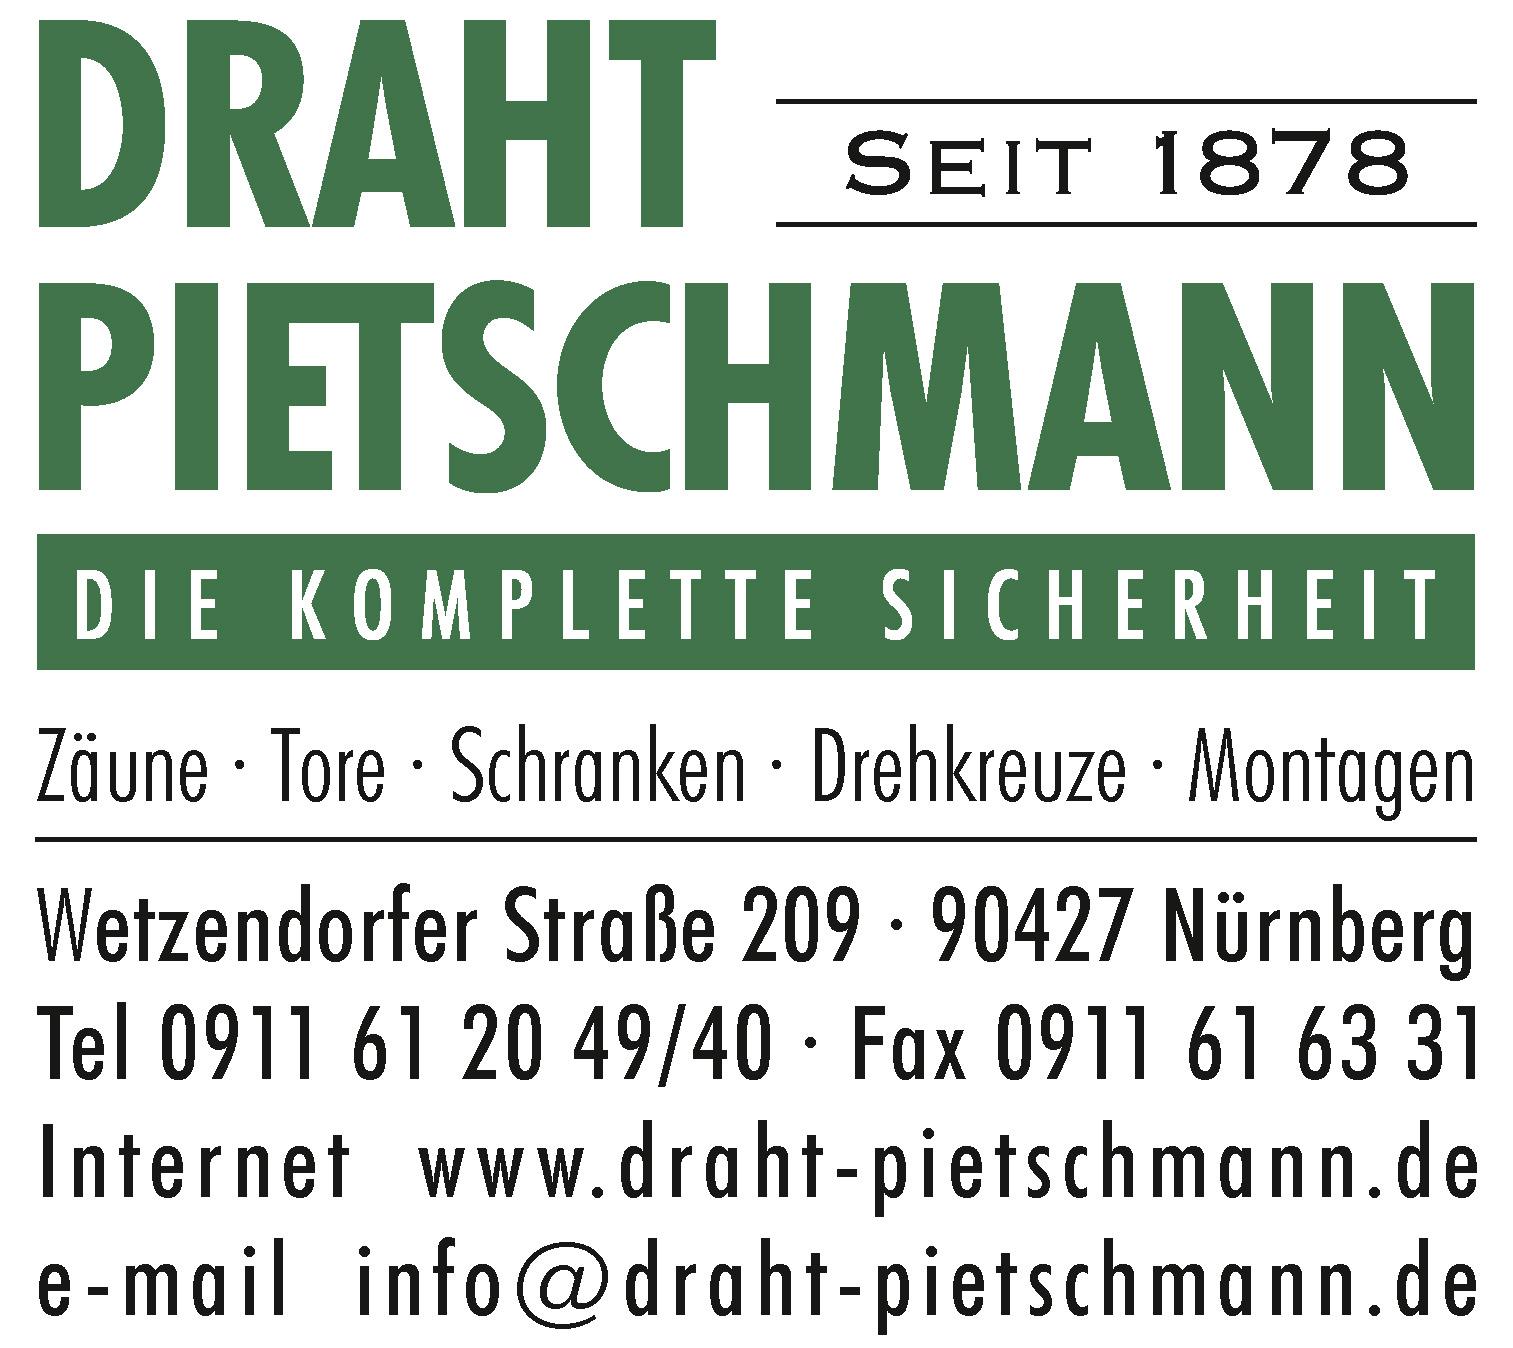 Draht Pietschman